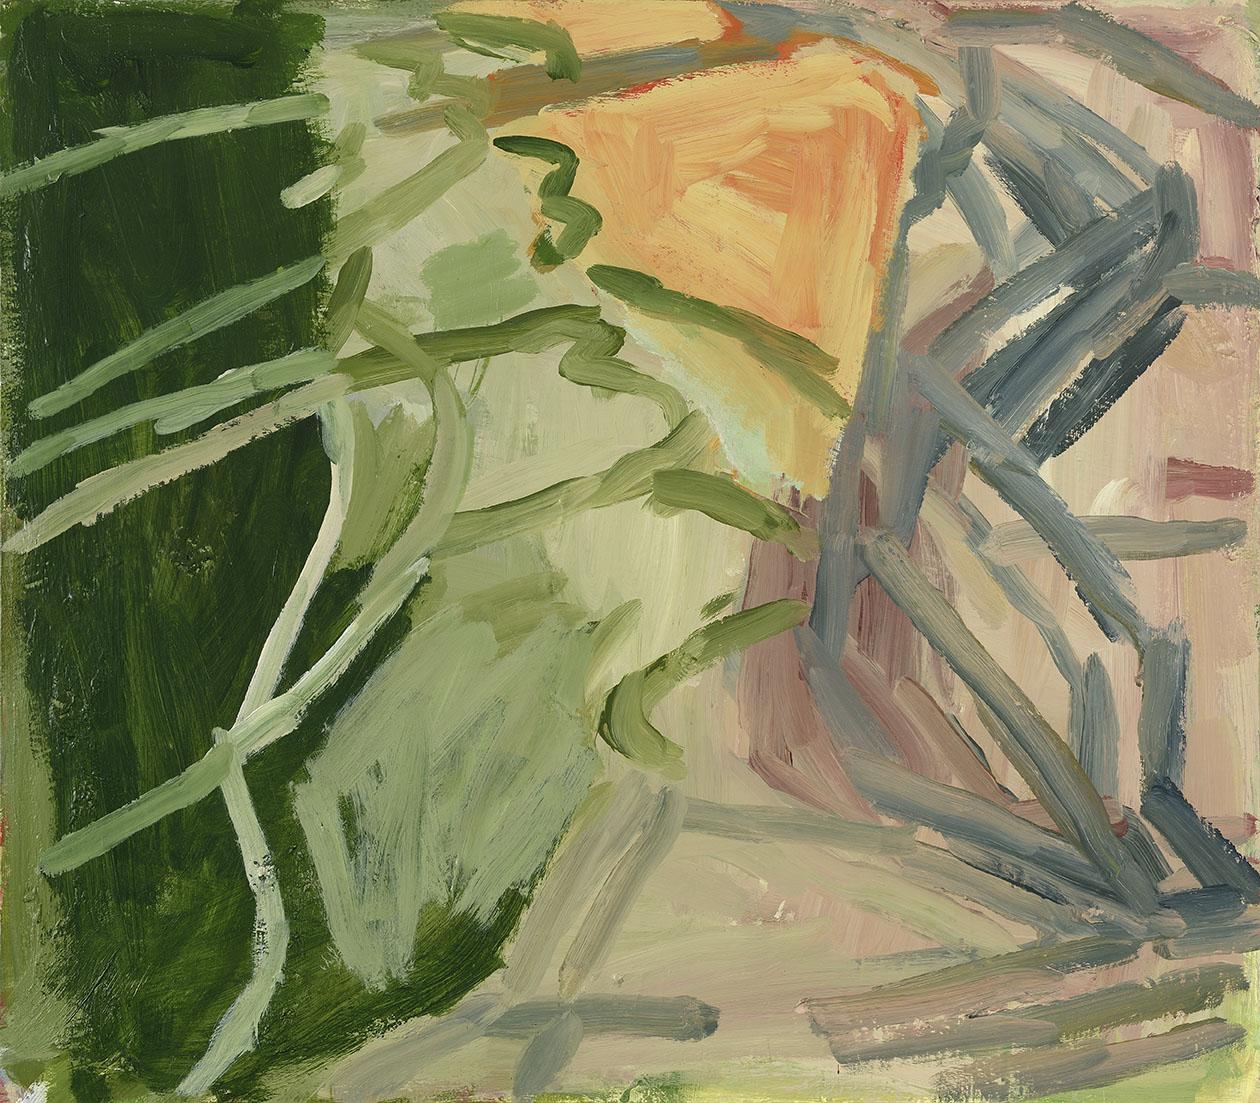 Simon Carter (b.1961)    Hipkin's Beach,  2013, Acrylic on canvas, 70 x 80 cm, Signed and dated on reverse  [CAS 69]